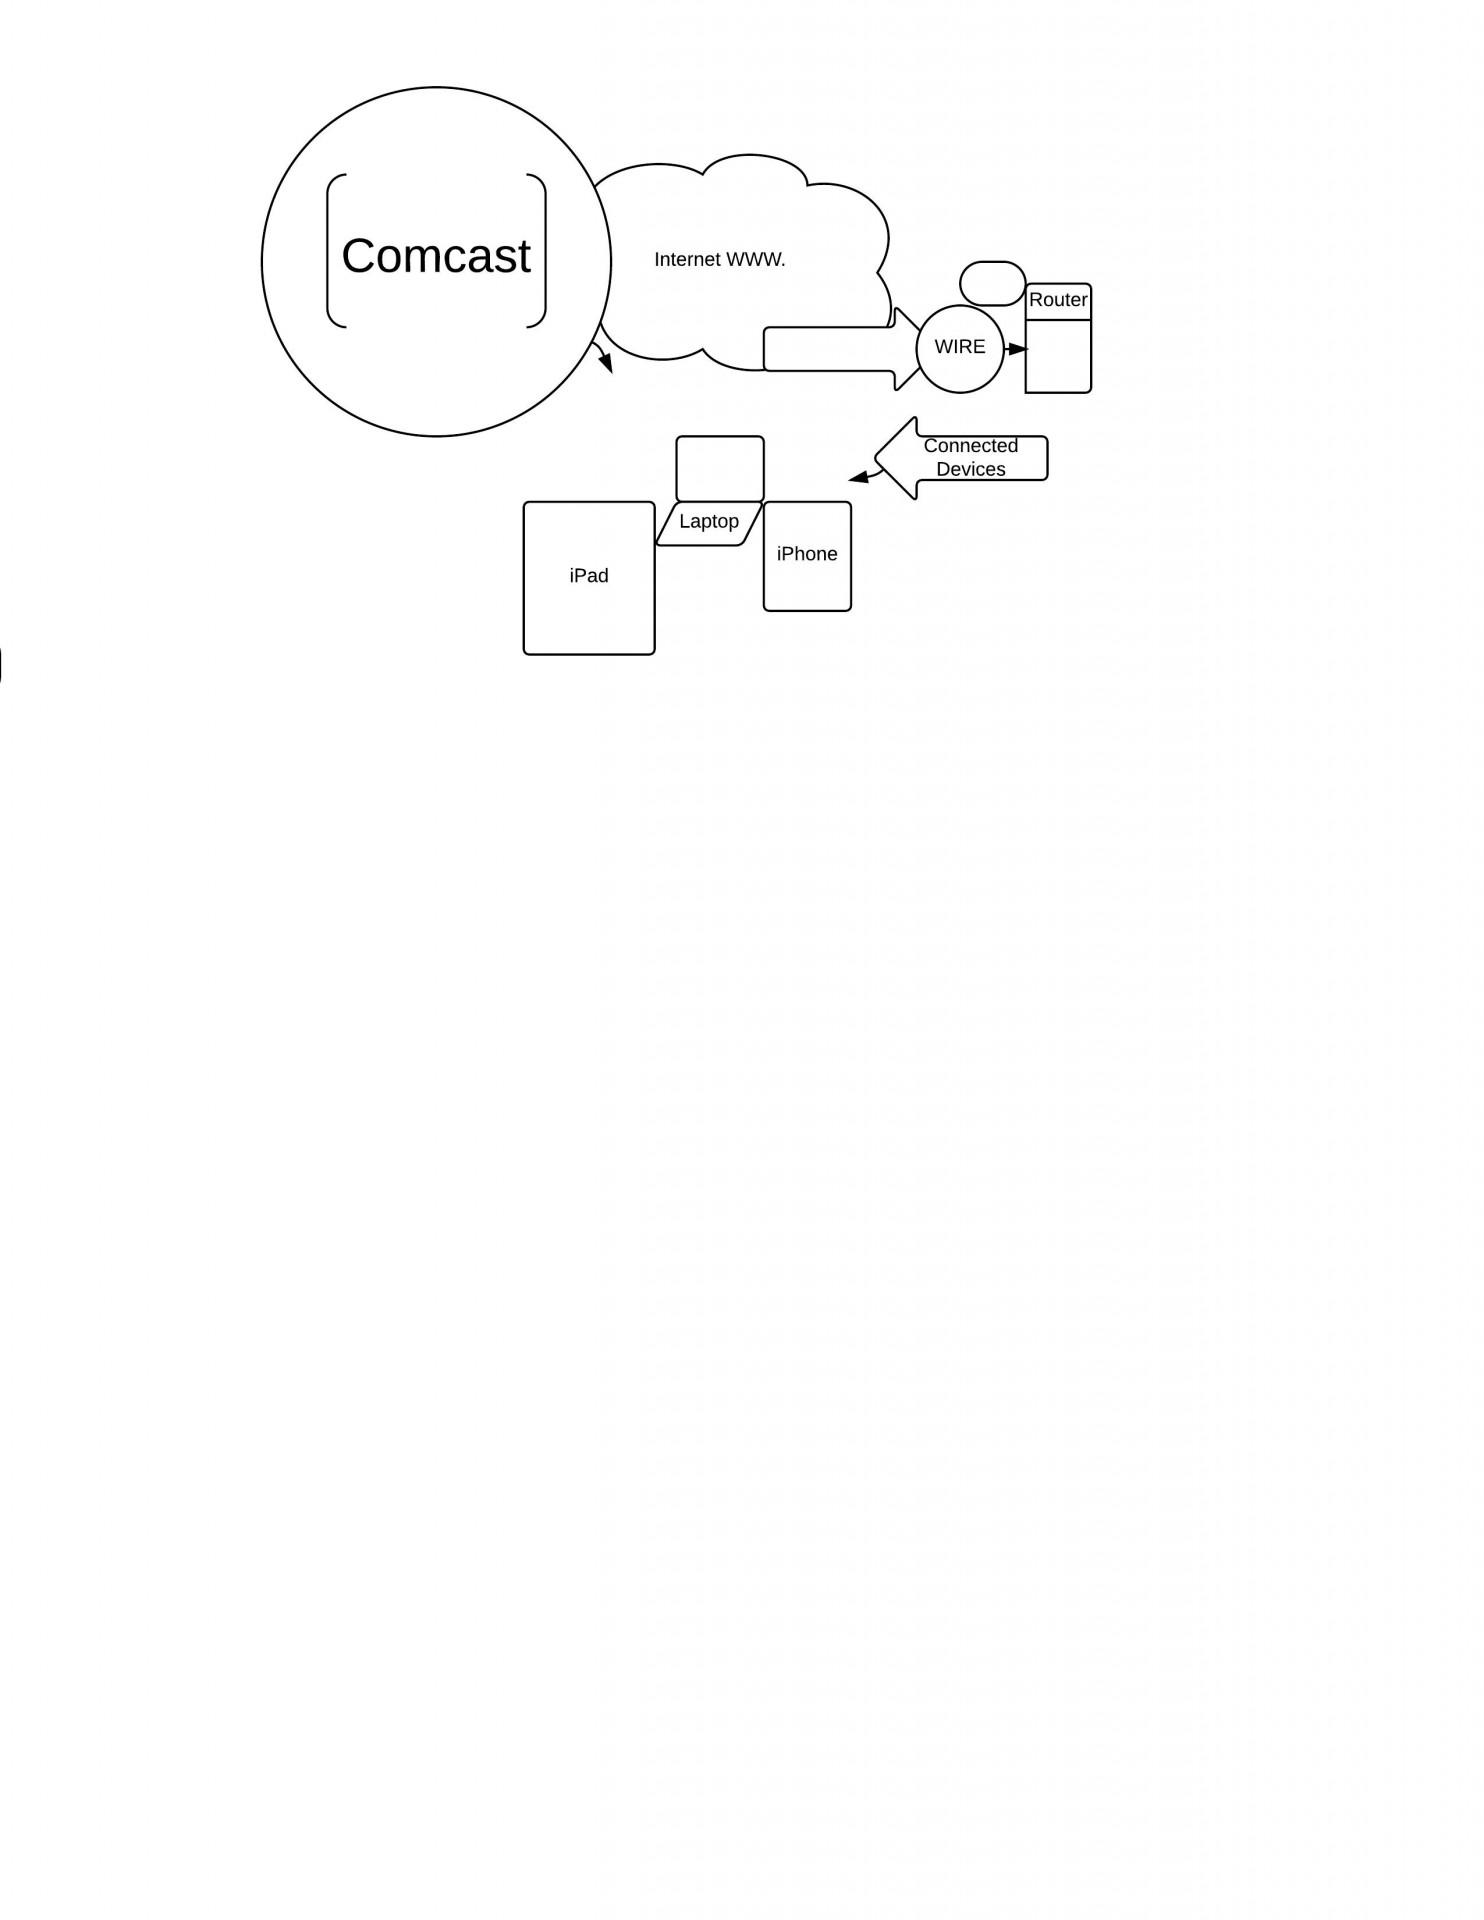 technology freshmen hull science leadership academy center city Best Home Network Diagram homenetwork